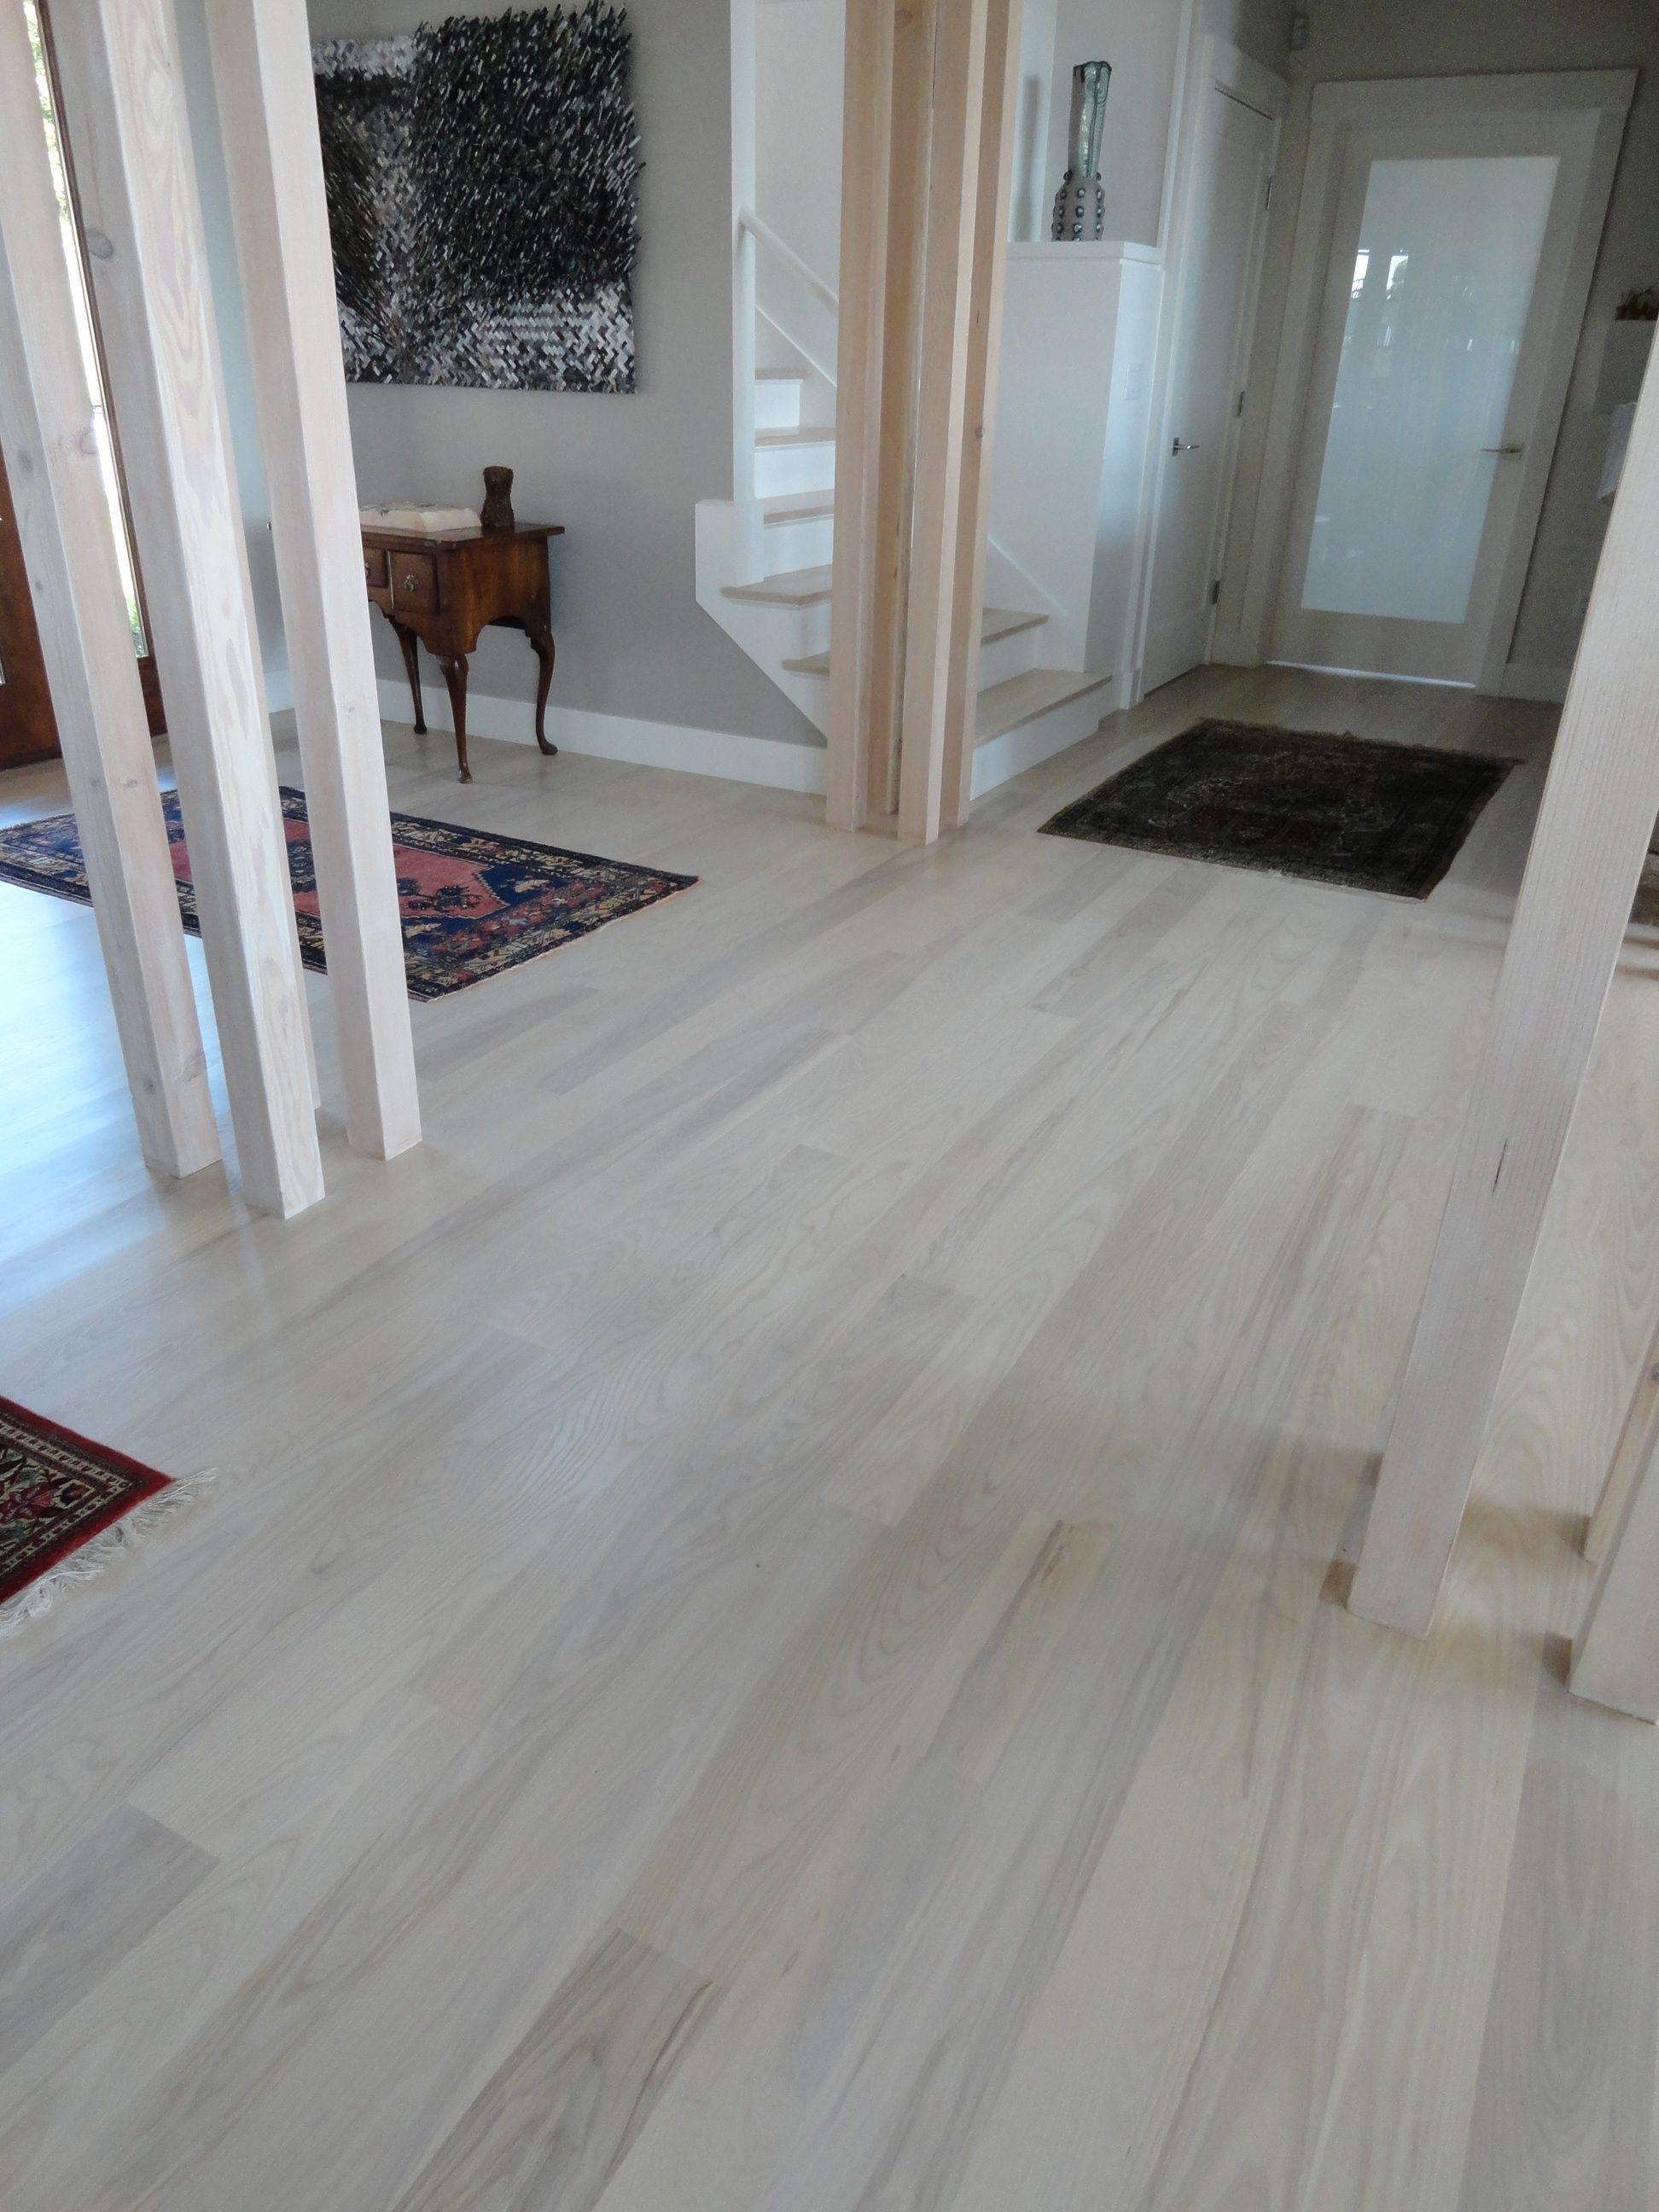 grey white oak flooring Google Search White wood